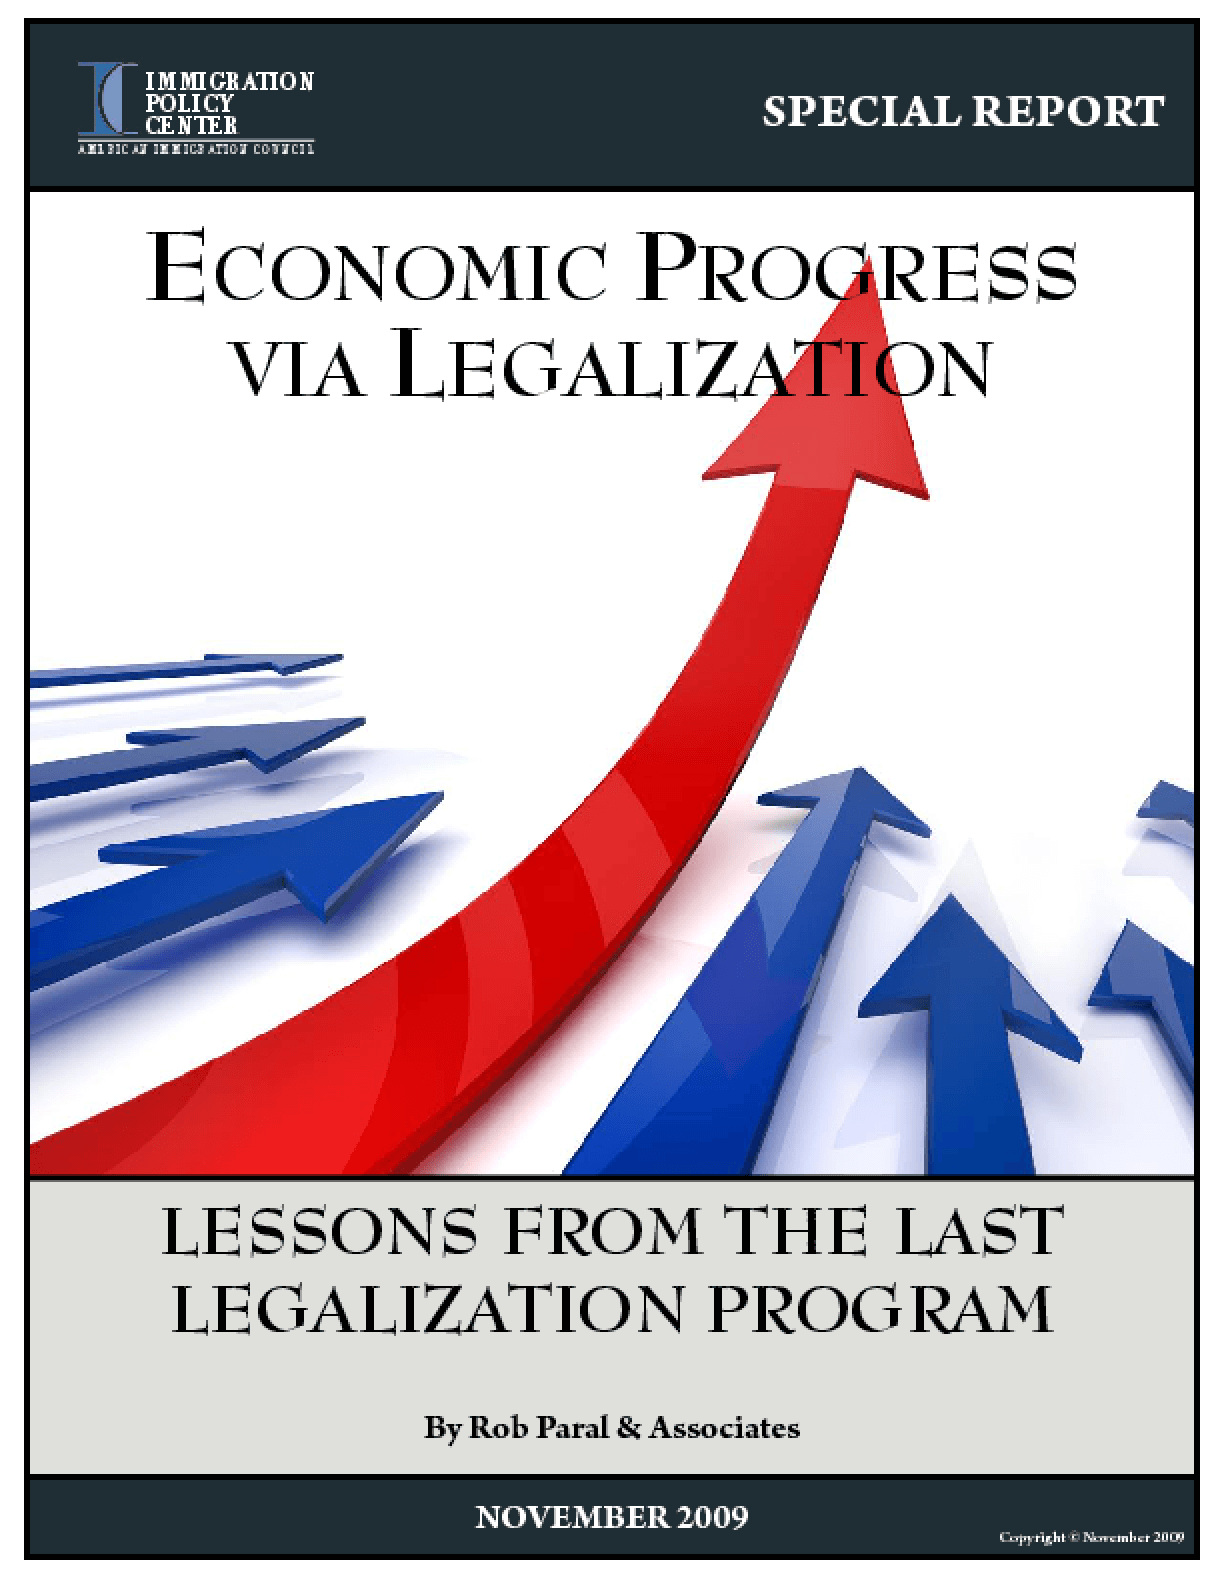 Economic Progress via Legalization: Lessons from the Last Legalization Program